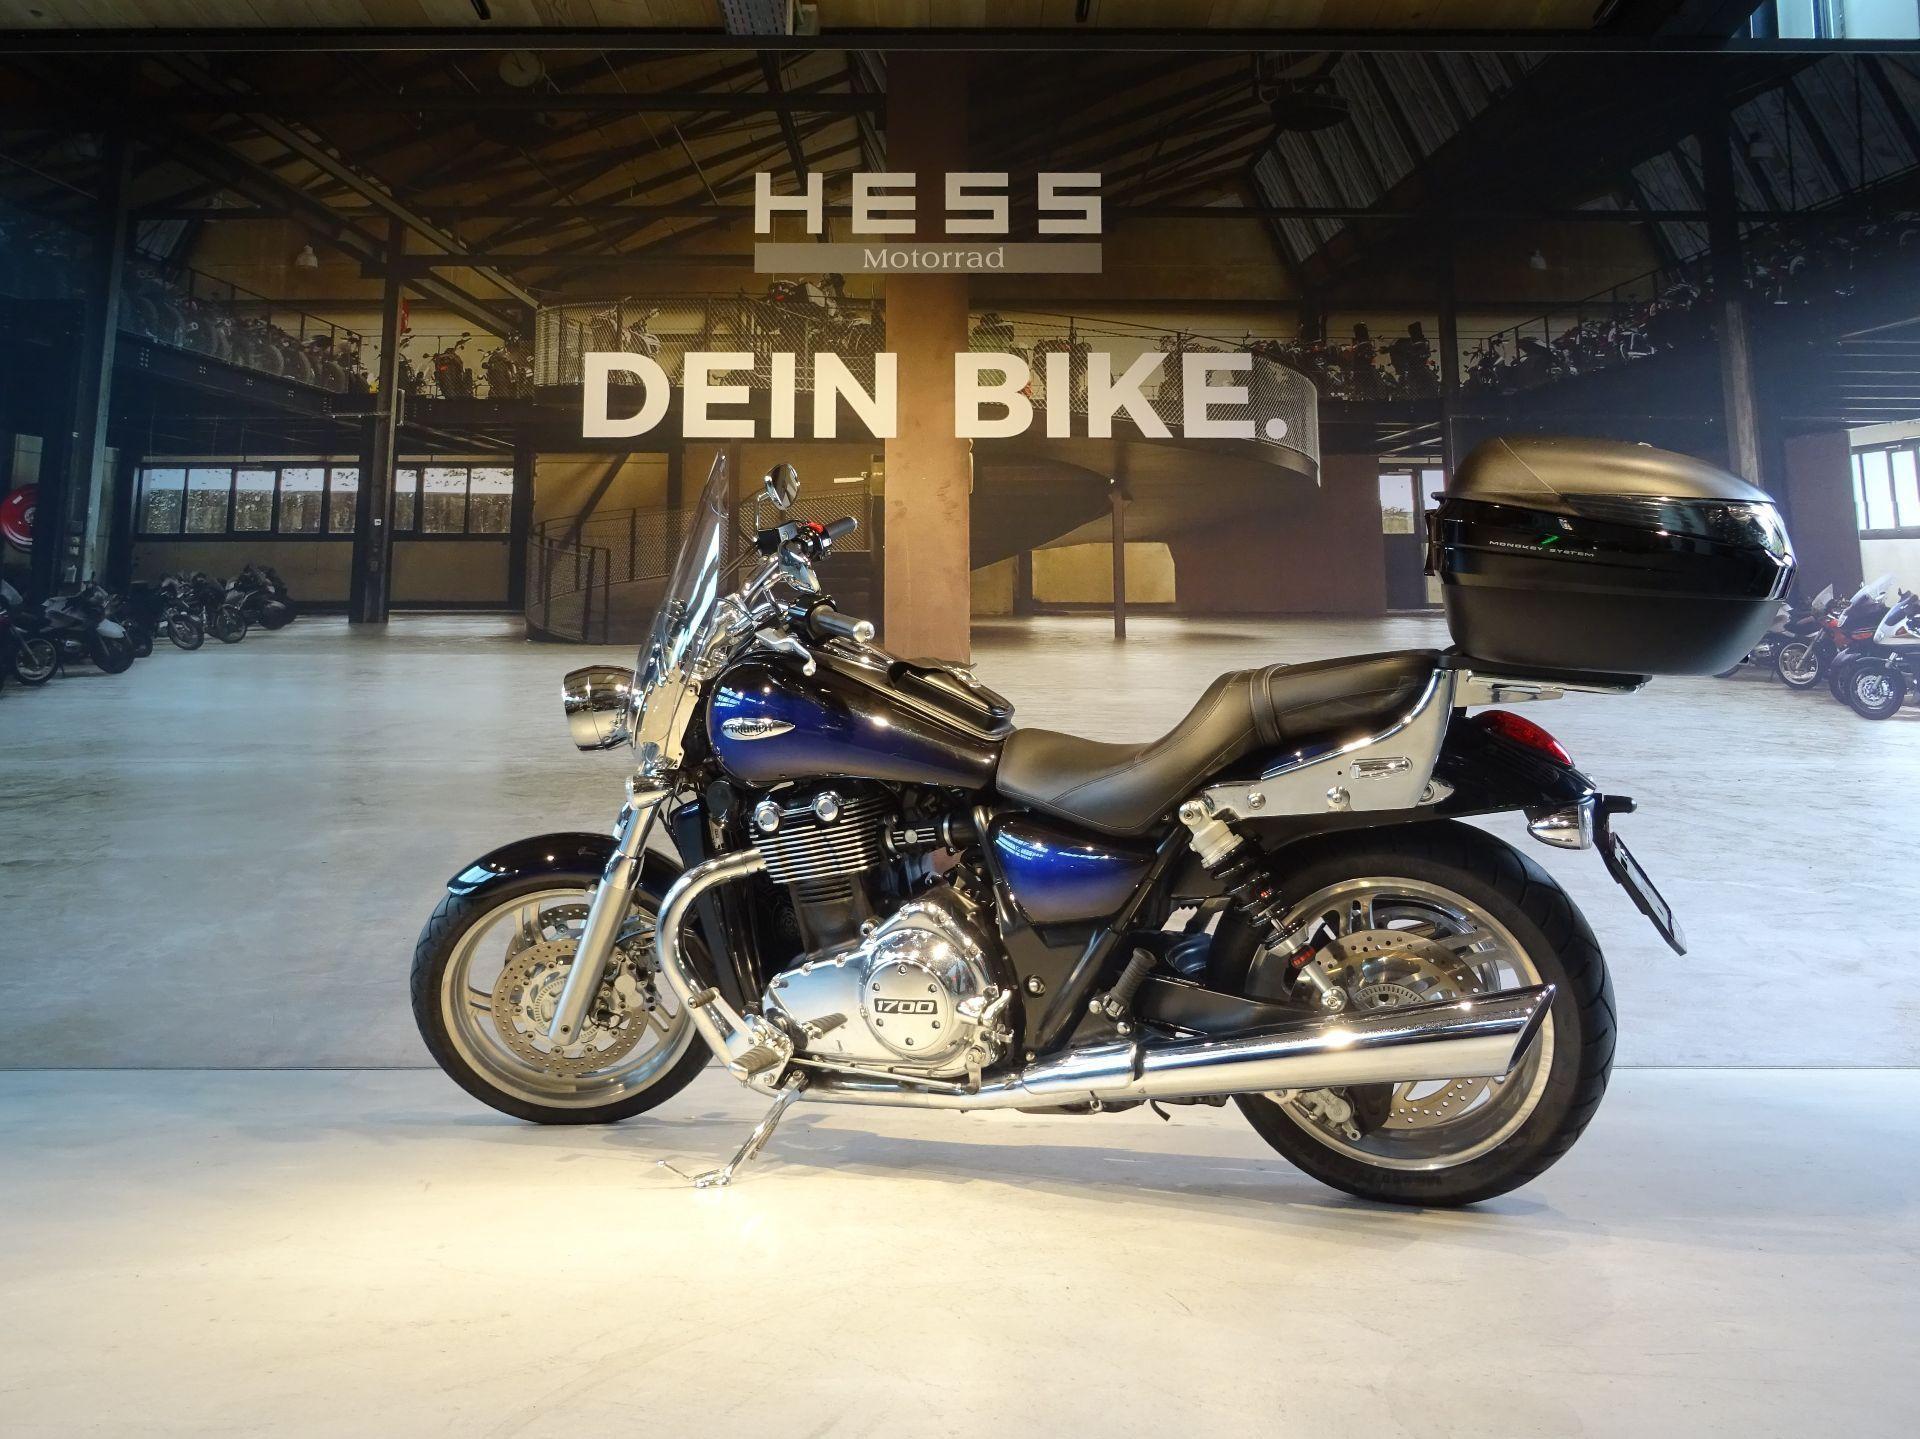 motorrad occasion kaufen triumph thunderbird 1700 abs hess motorrad stettlen. Black Bedroom Furniture Sets. Home Design Ideas